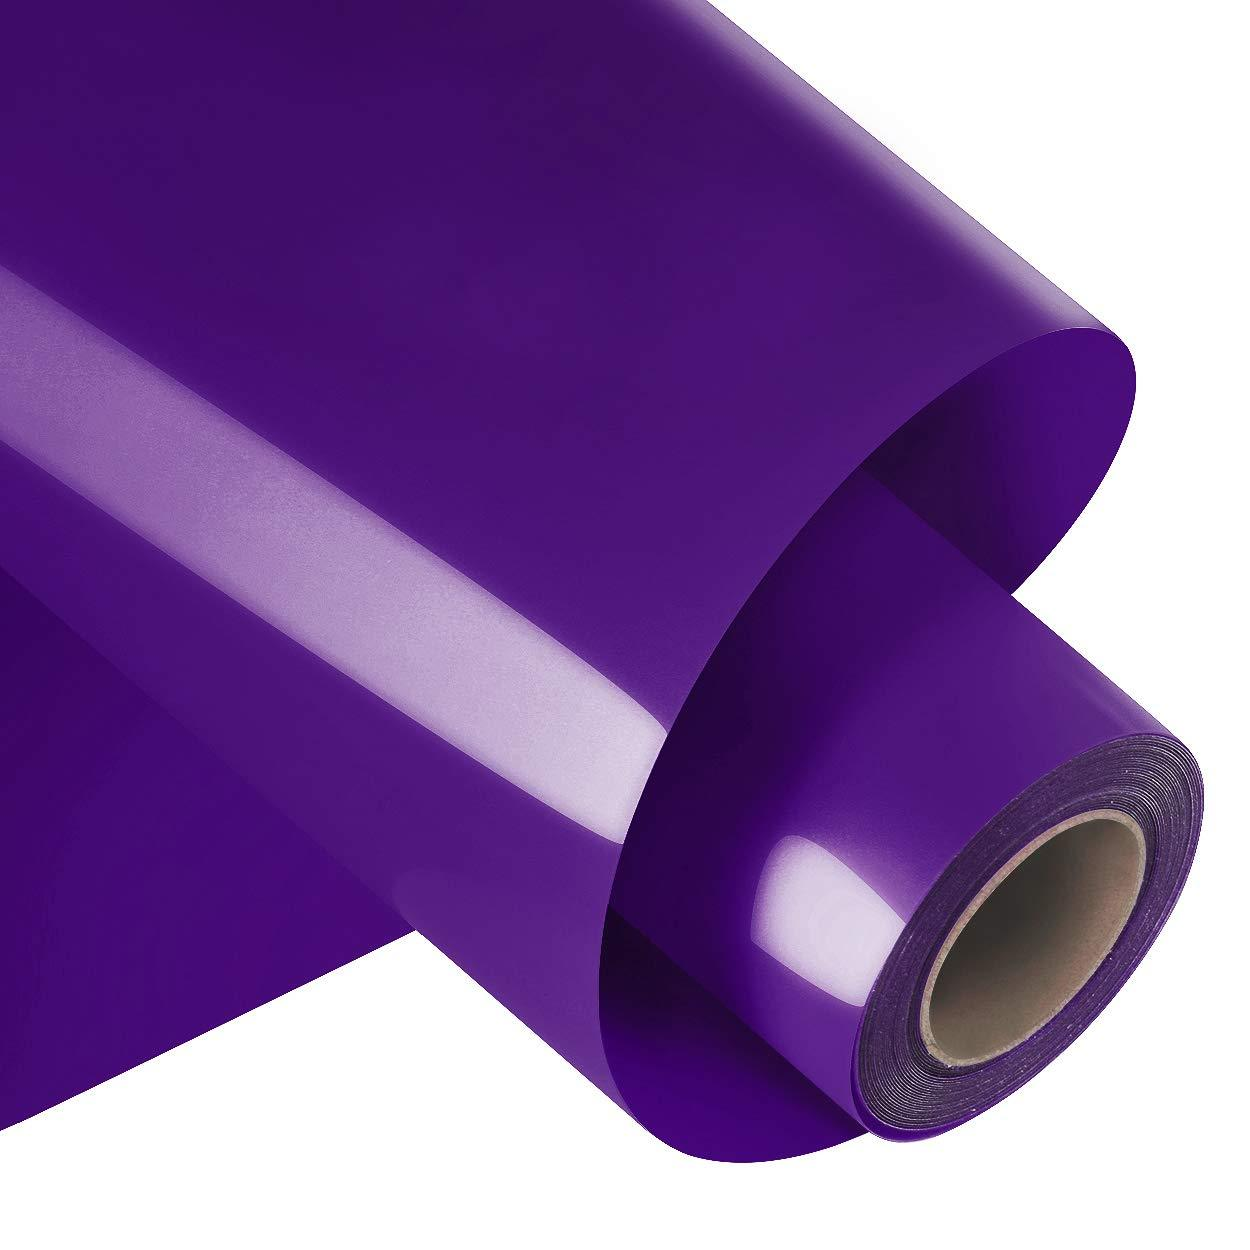 Power PU - Termocolante Recorte Plotter Roxo - 30 cm